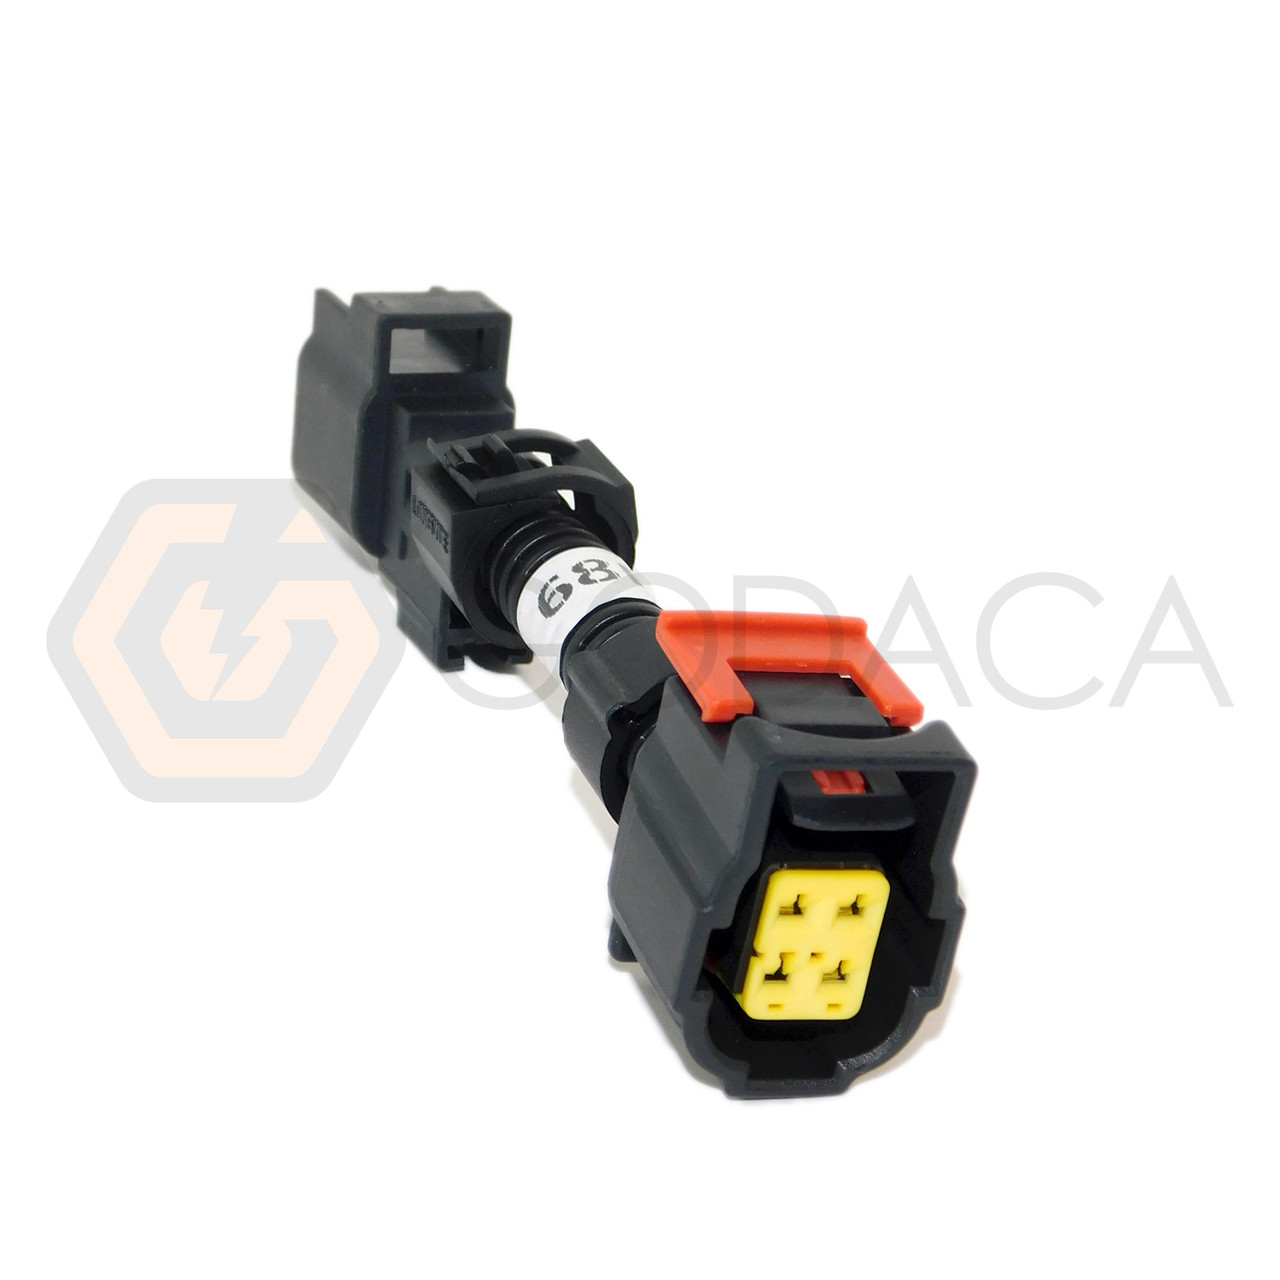 1x wiring harness for dodge chrysler transmission line pressure booster 68rfe godaca llc  [ 1280 x 1280 Pixel ]